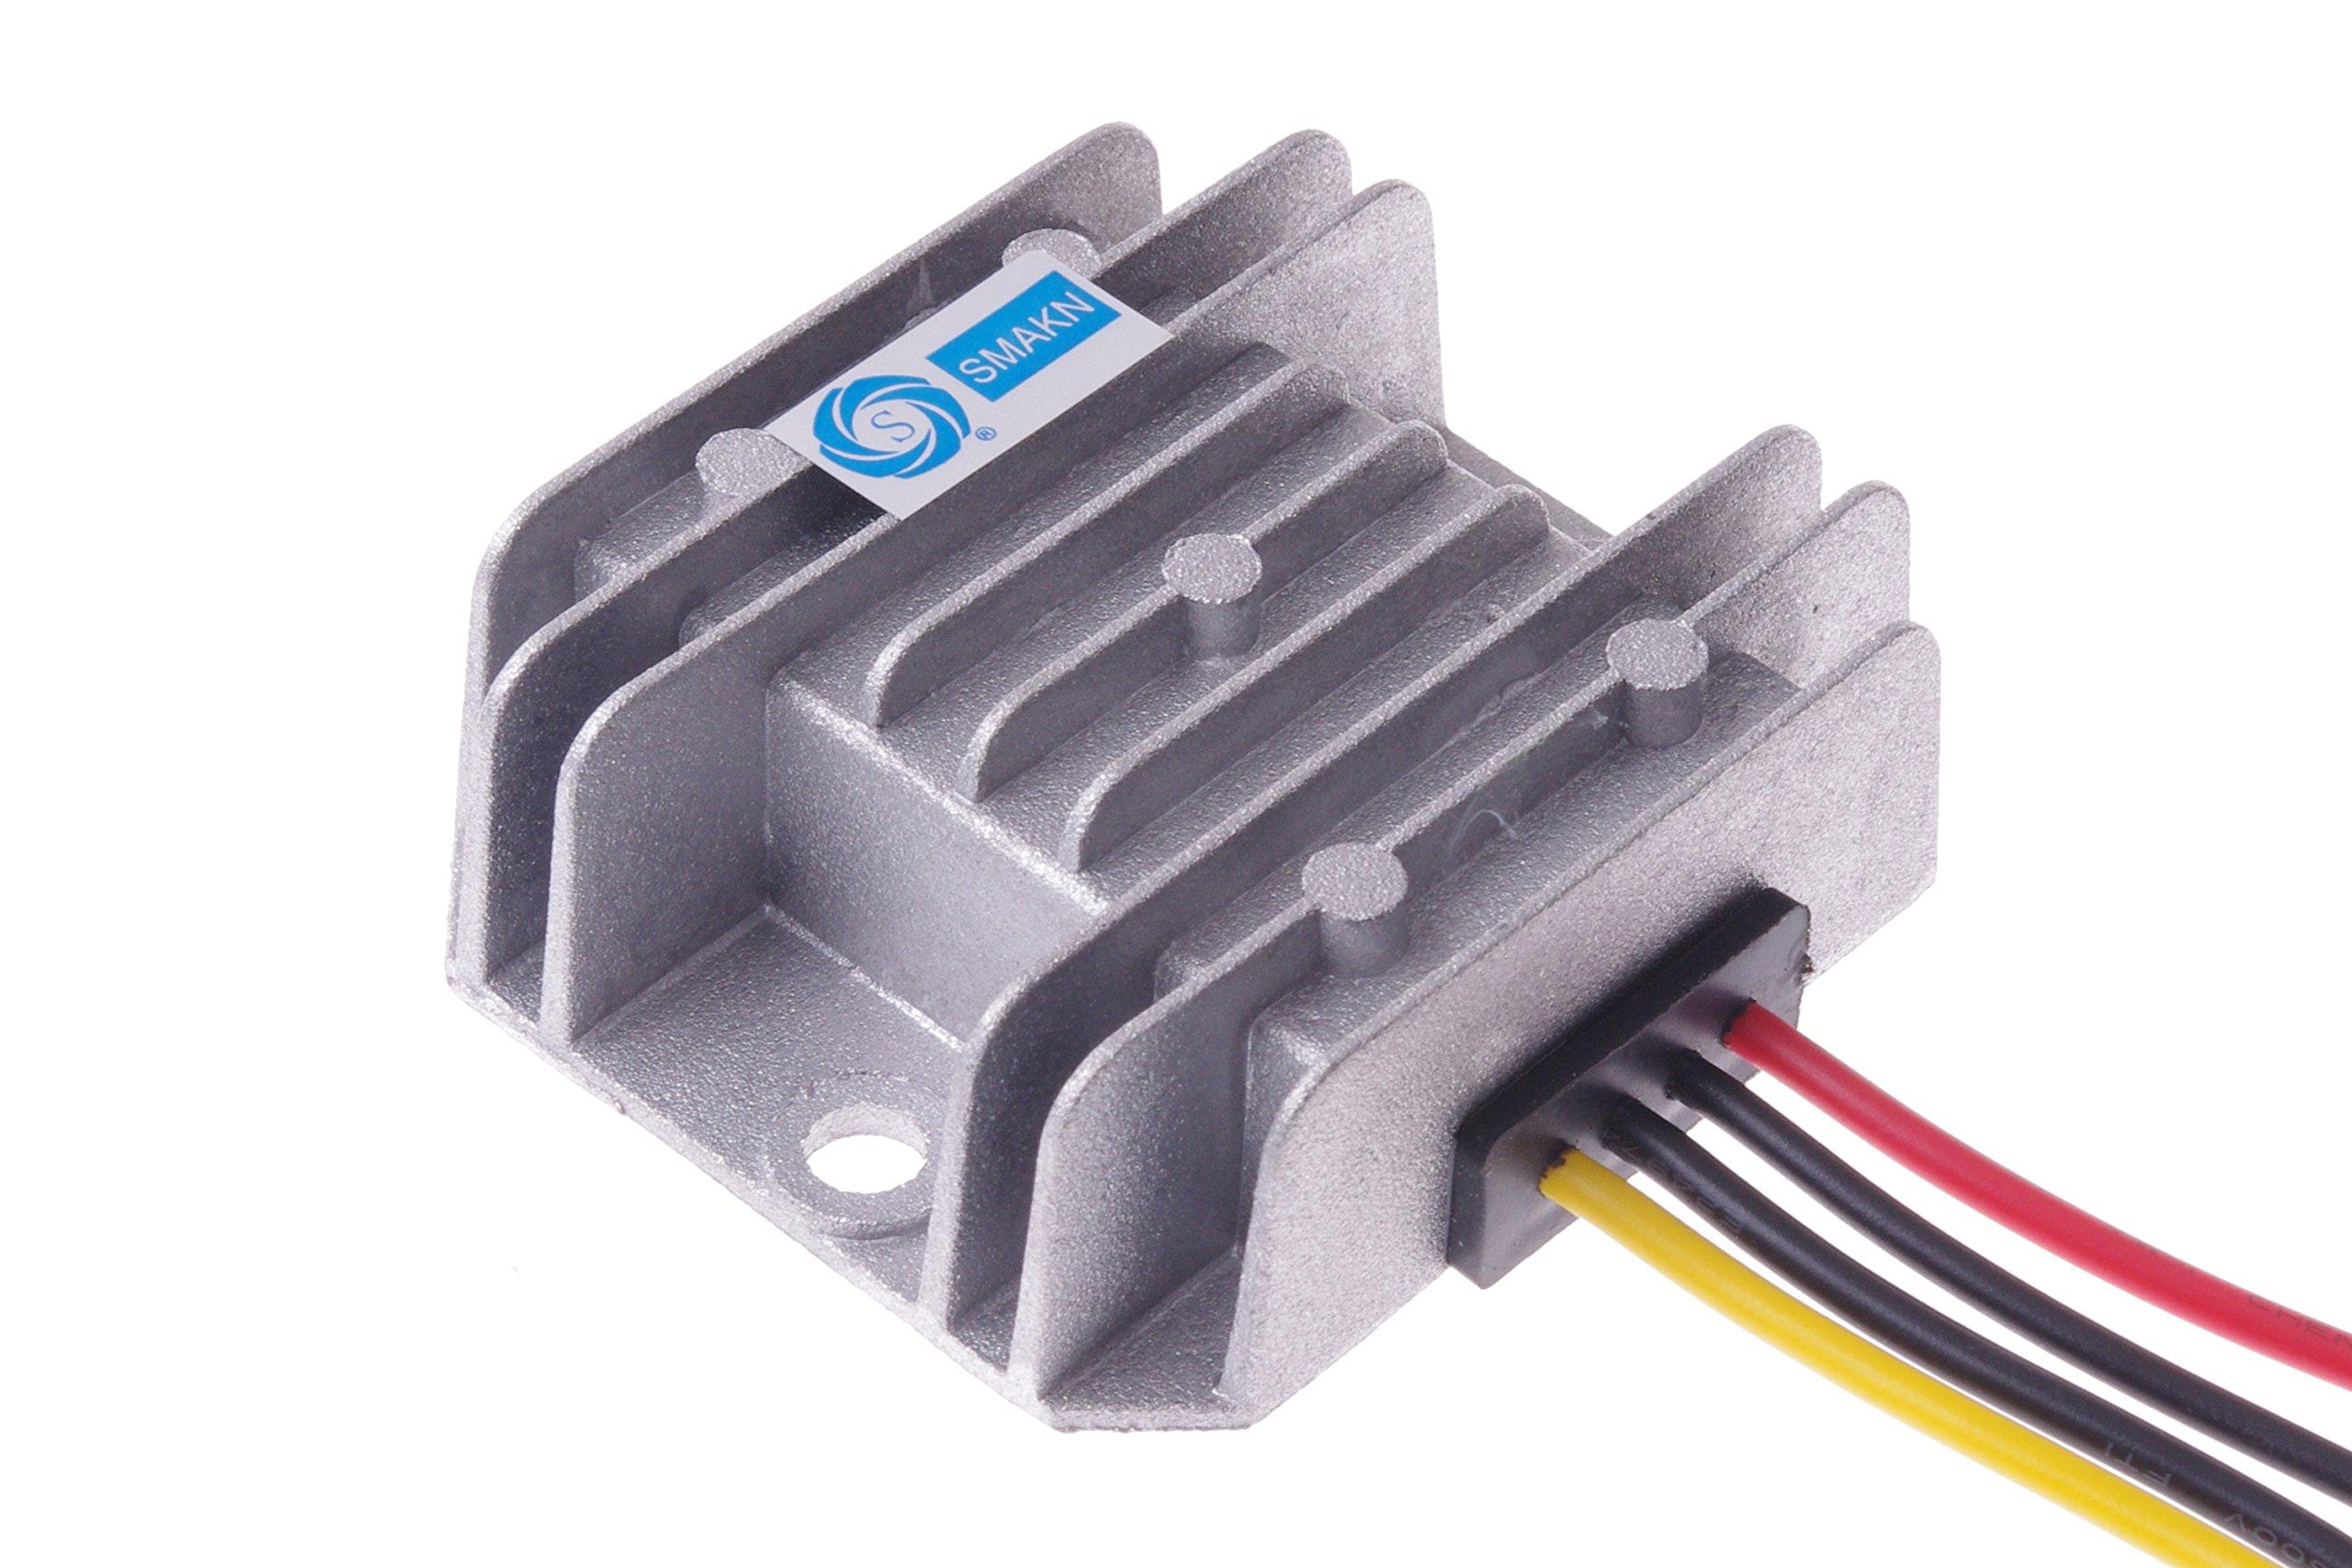 SMAKN® DC-DC Voltage Step-Down Converter Buck Module 12V/24V/36V/48V to 5V 5A 25W Car LED power converter Waterproof by SMAKN (Image #3)